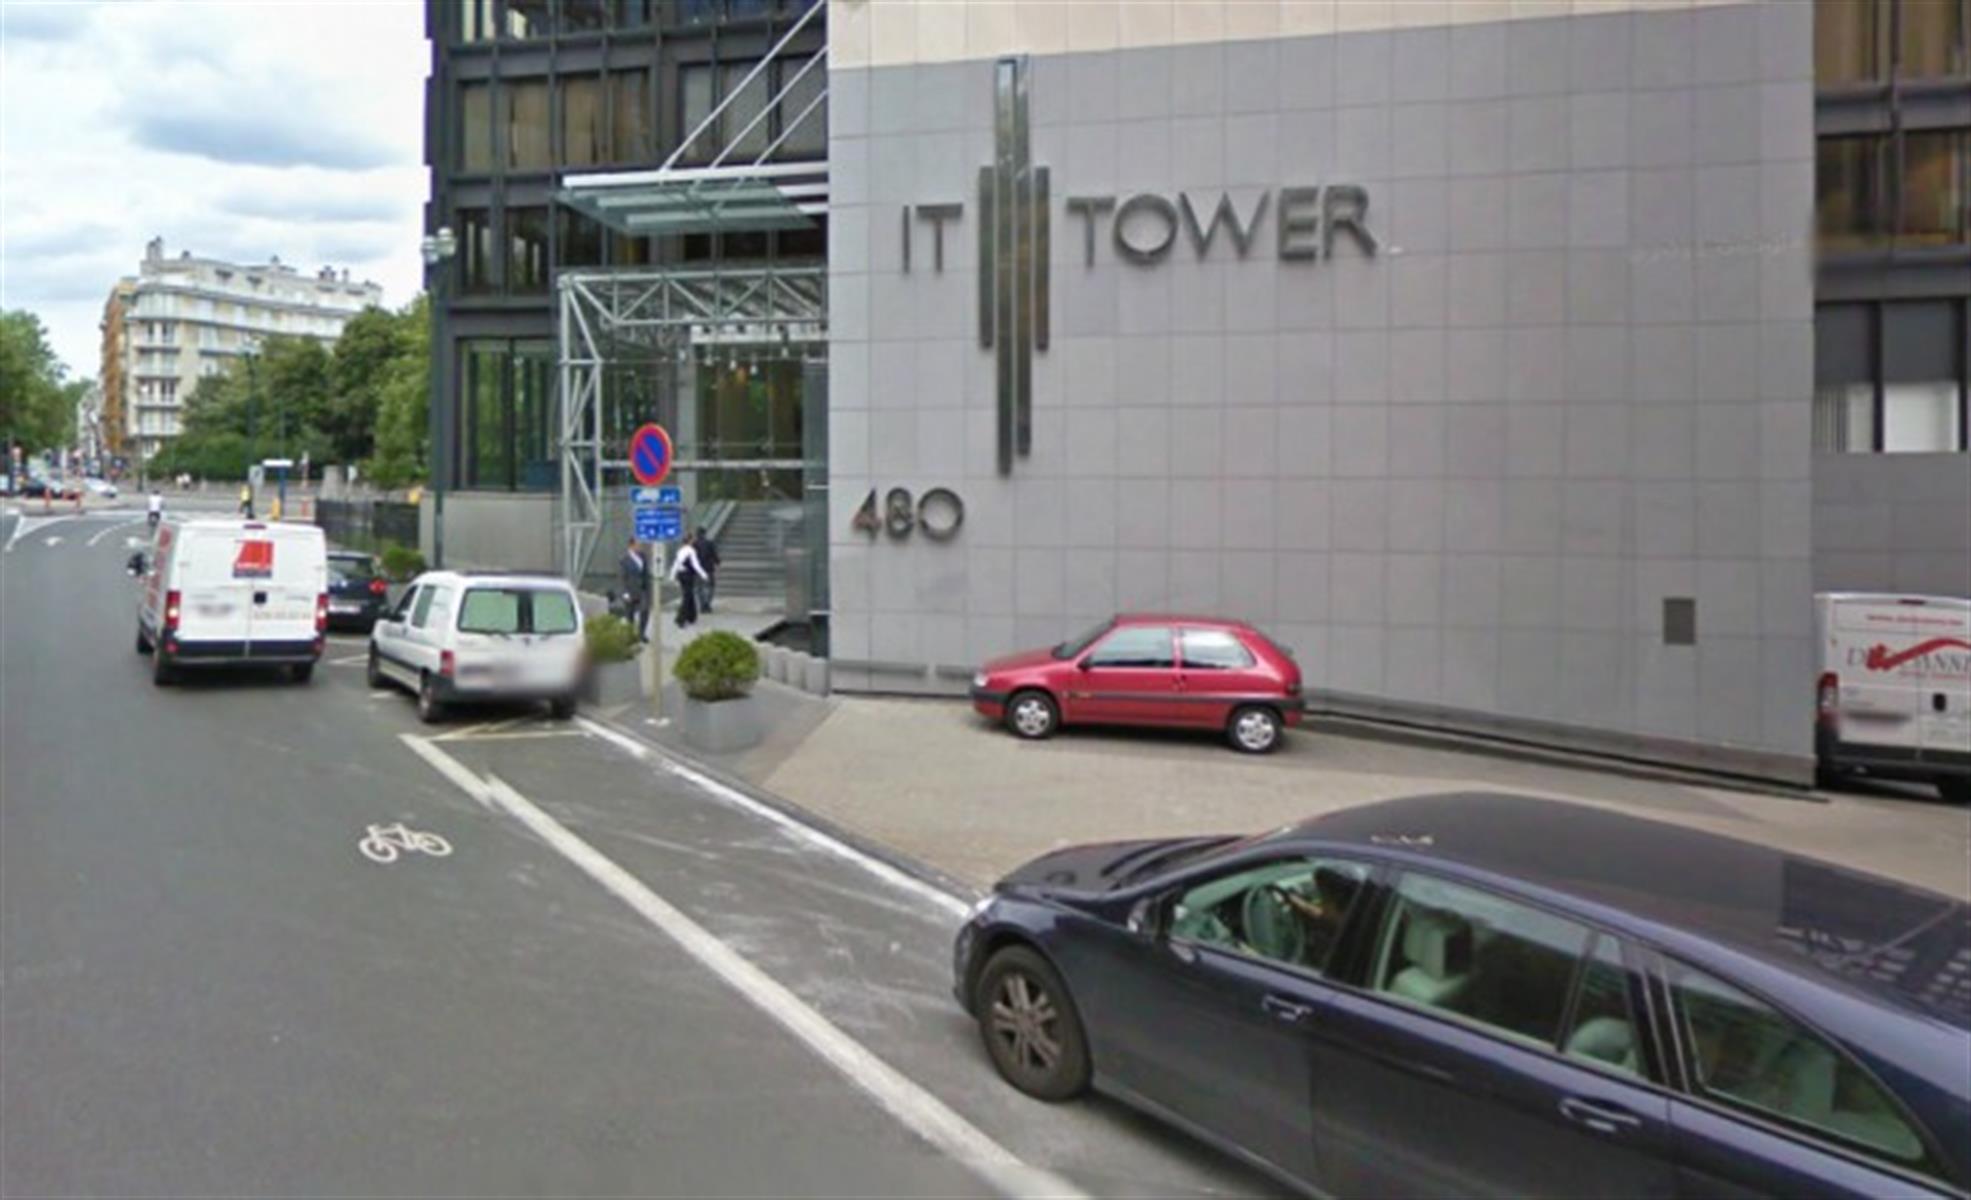 LOUISE 480    IT TOWER - Ixelles - #2974781-5